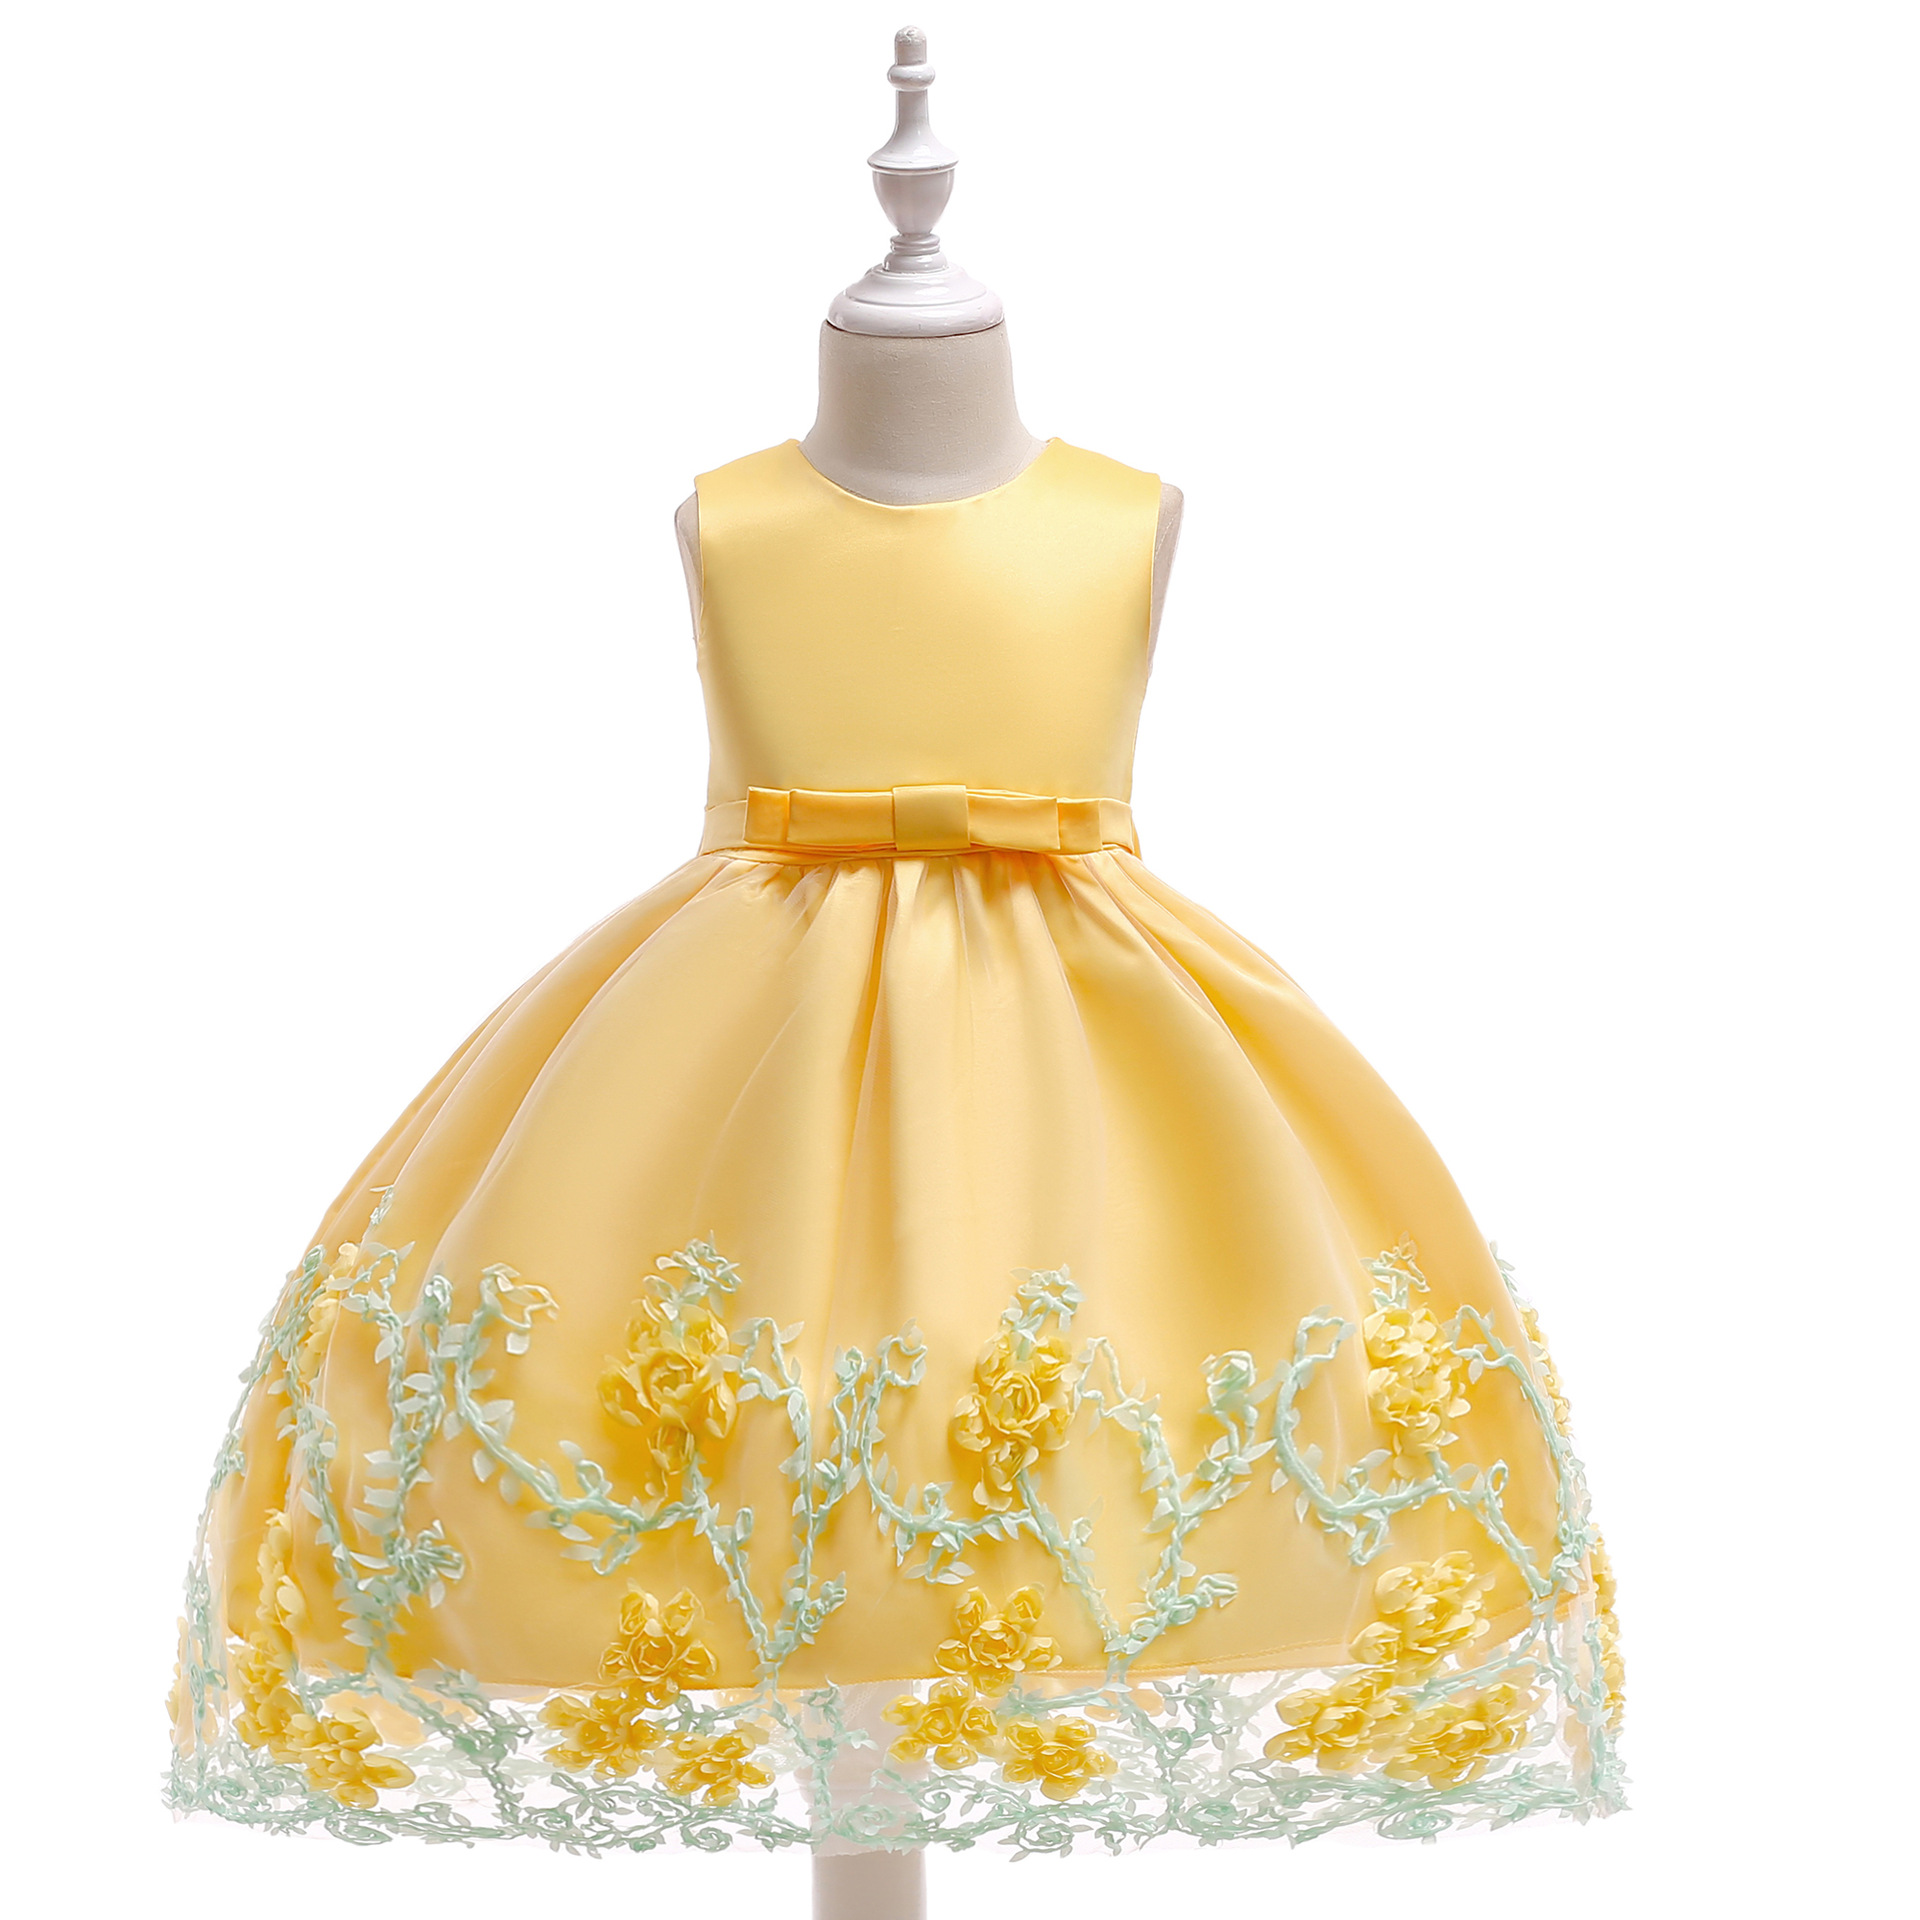 Girls Dress 2019 Summer New Style Europe And America Princess Relief Broken Flower High-waisted Gauze Formal Dress Cotton Inner